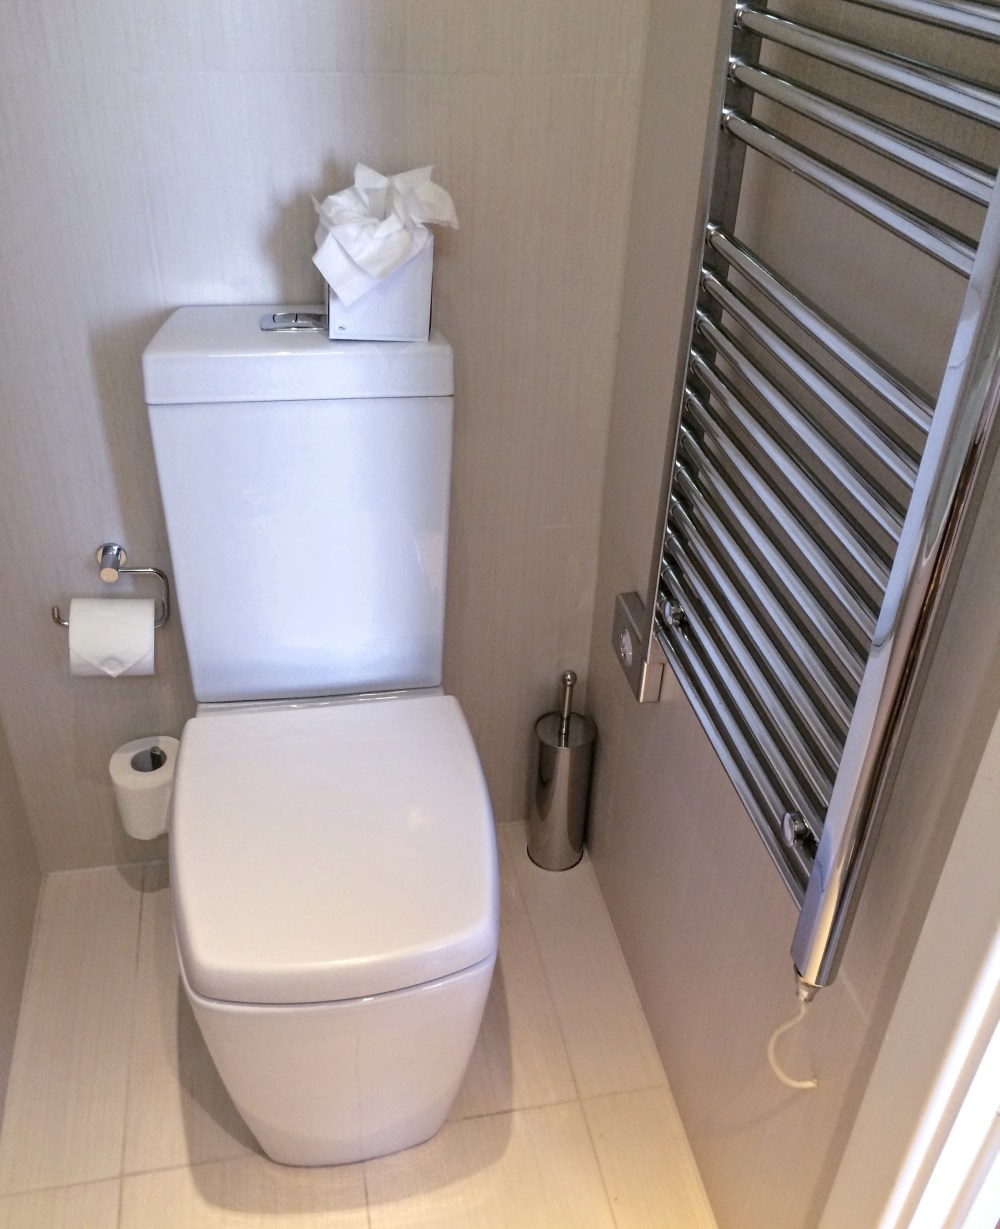 medium resolution of diagram of part of toilet